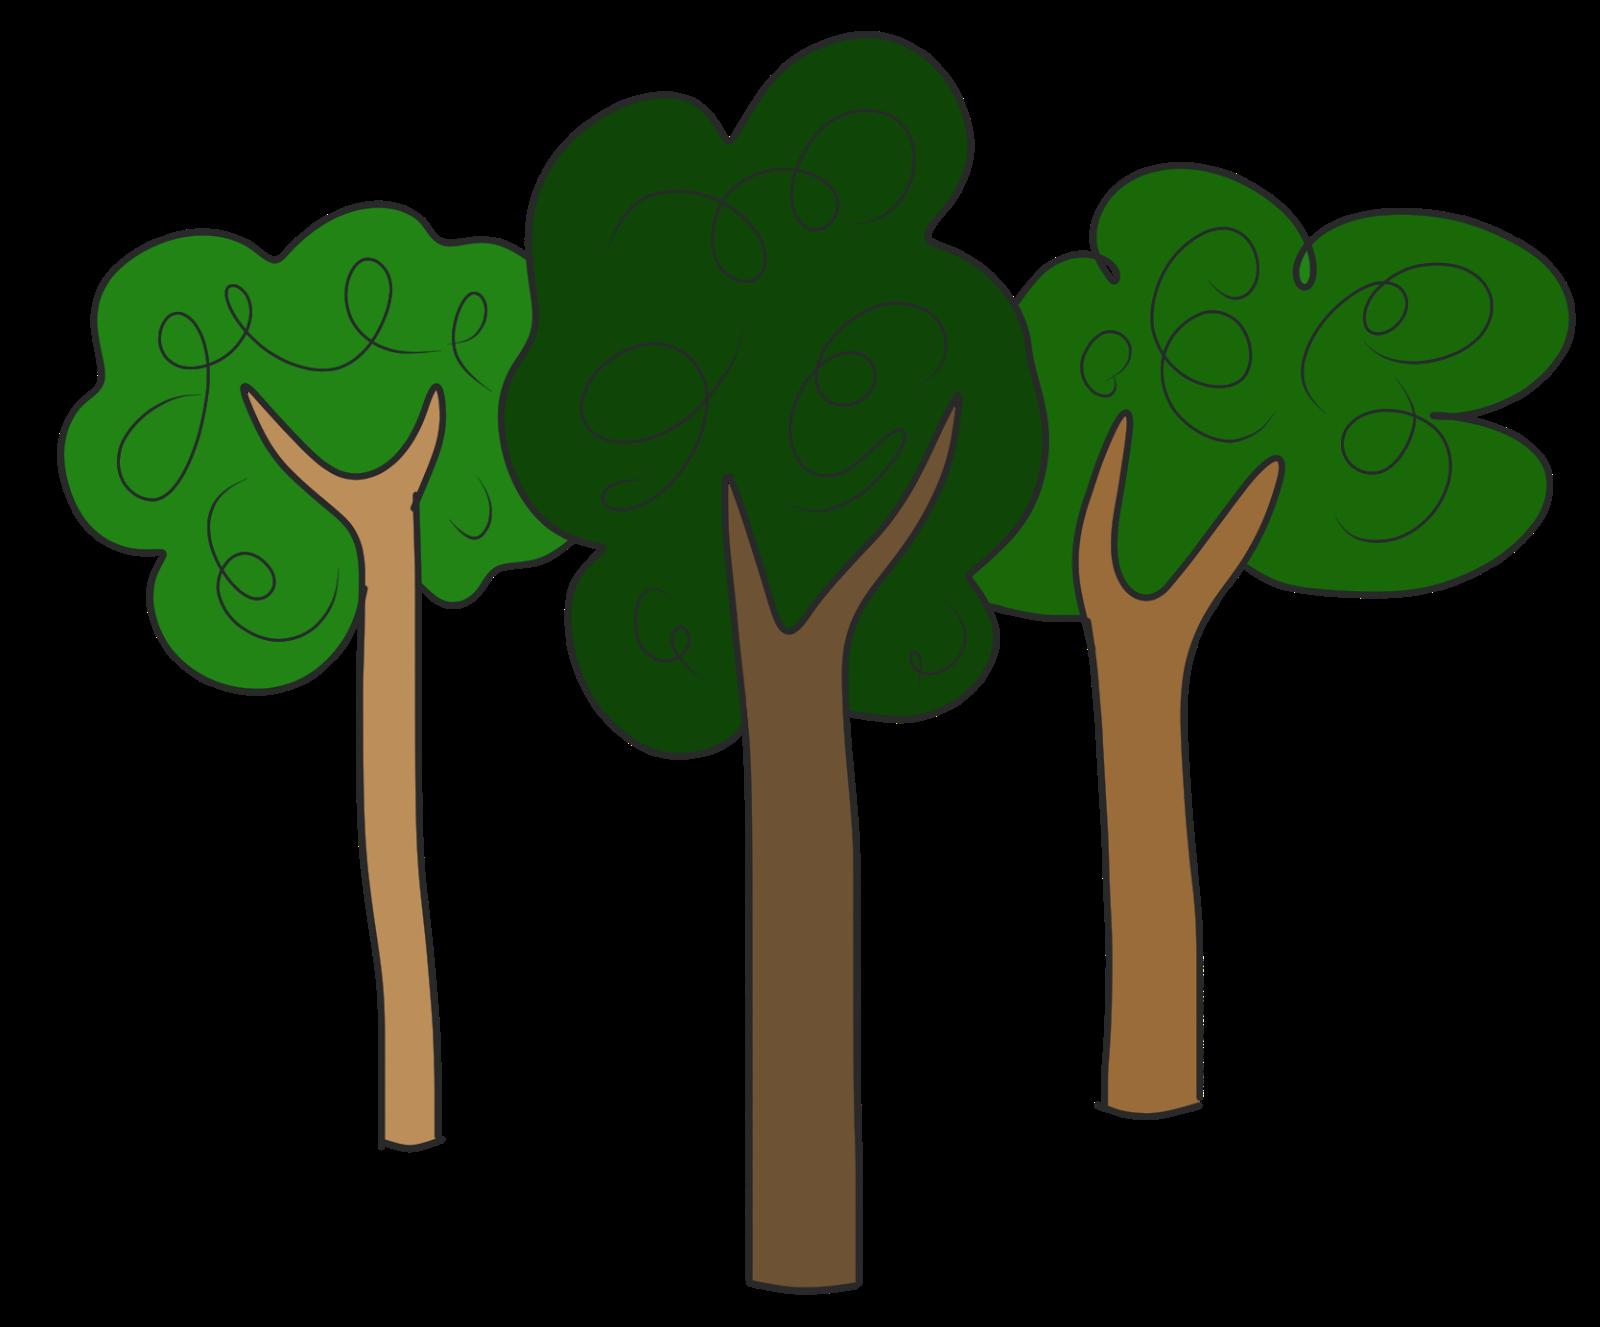 Clipart Trees Clipart-Clipart trees clipart-2